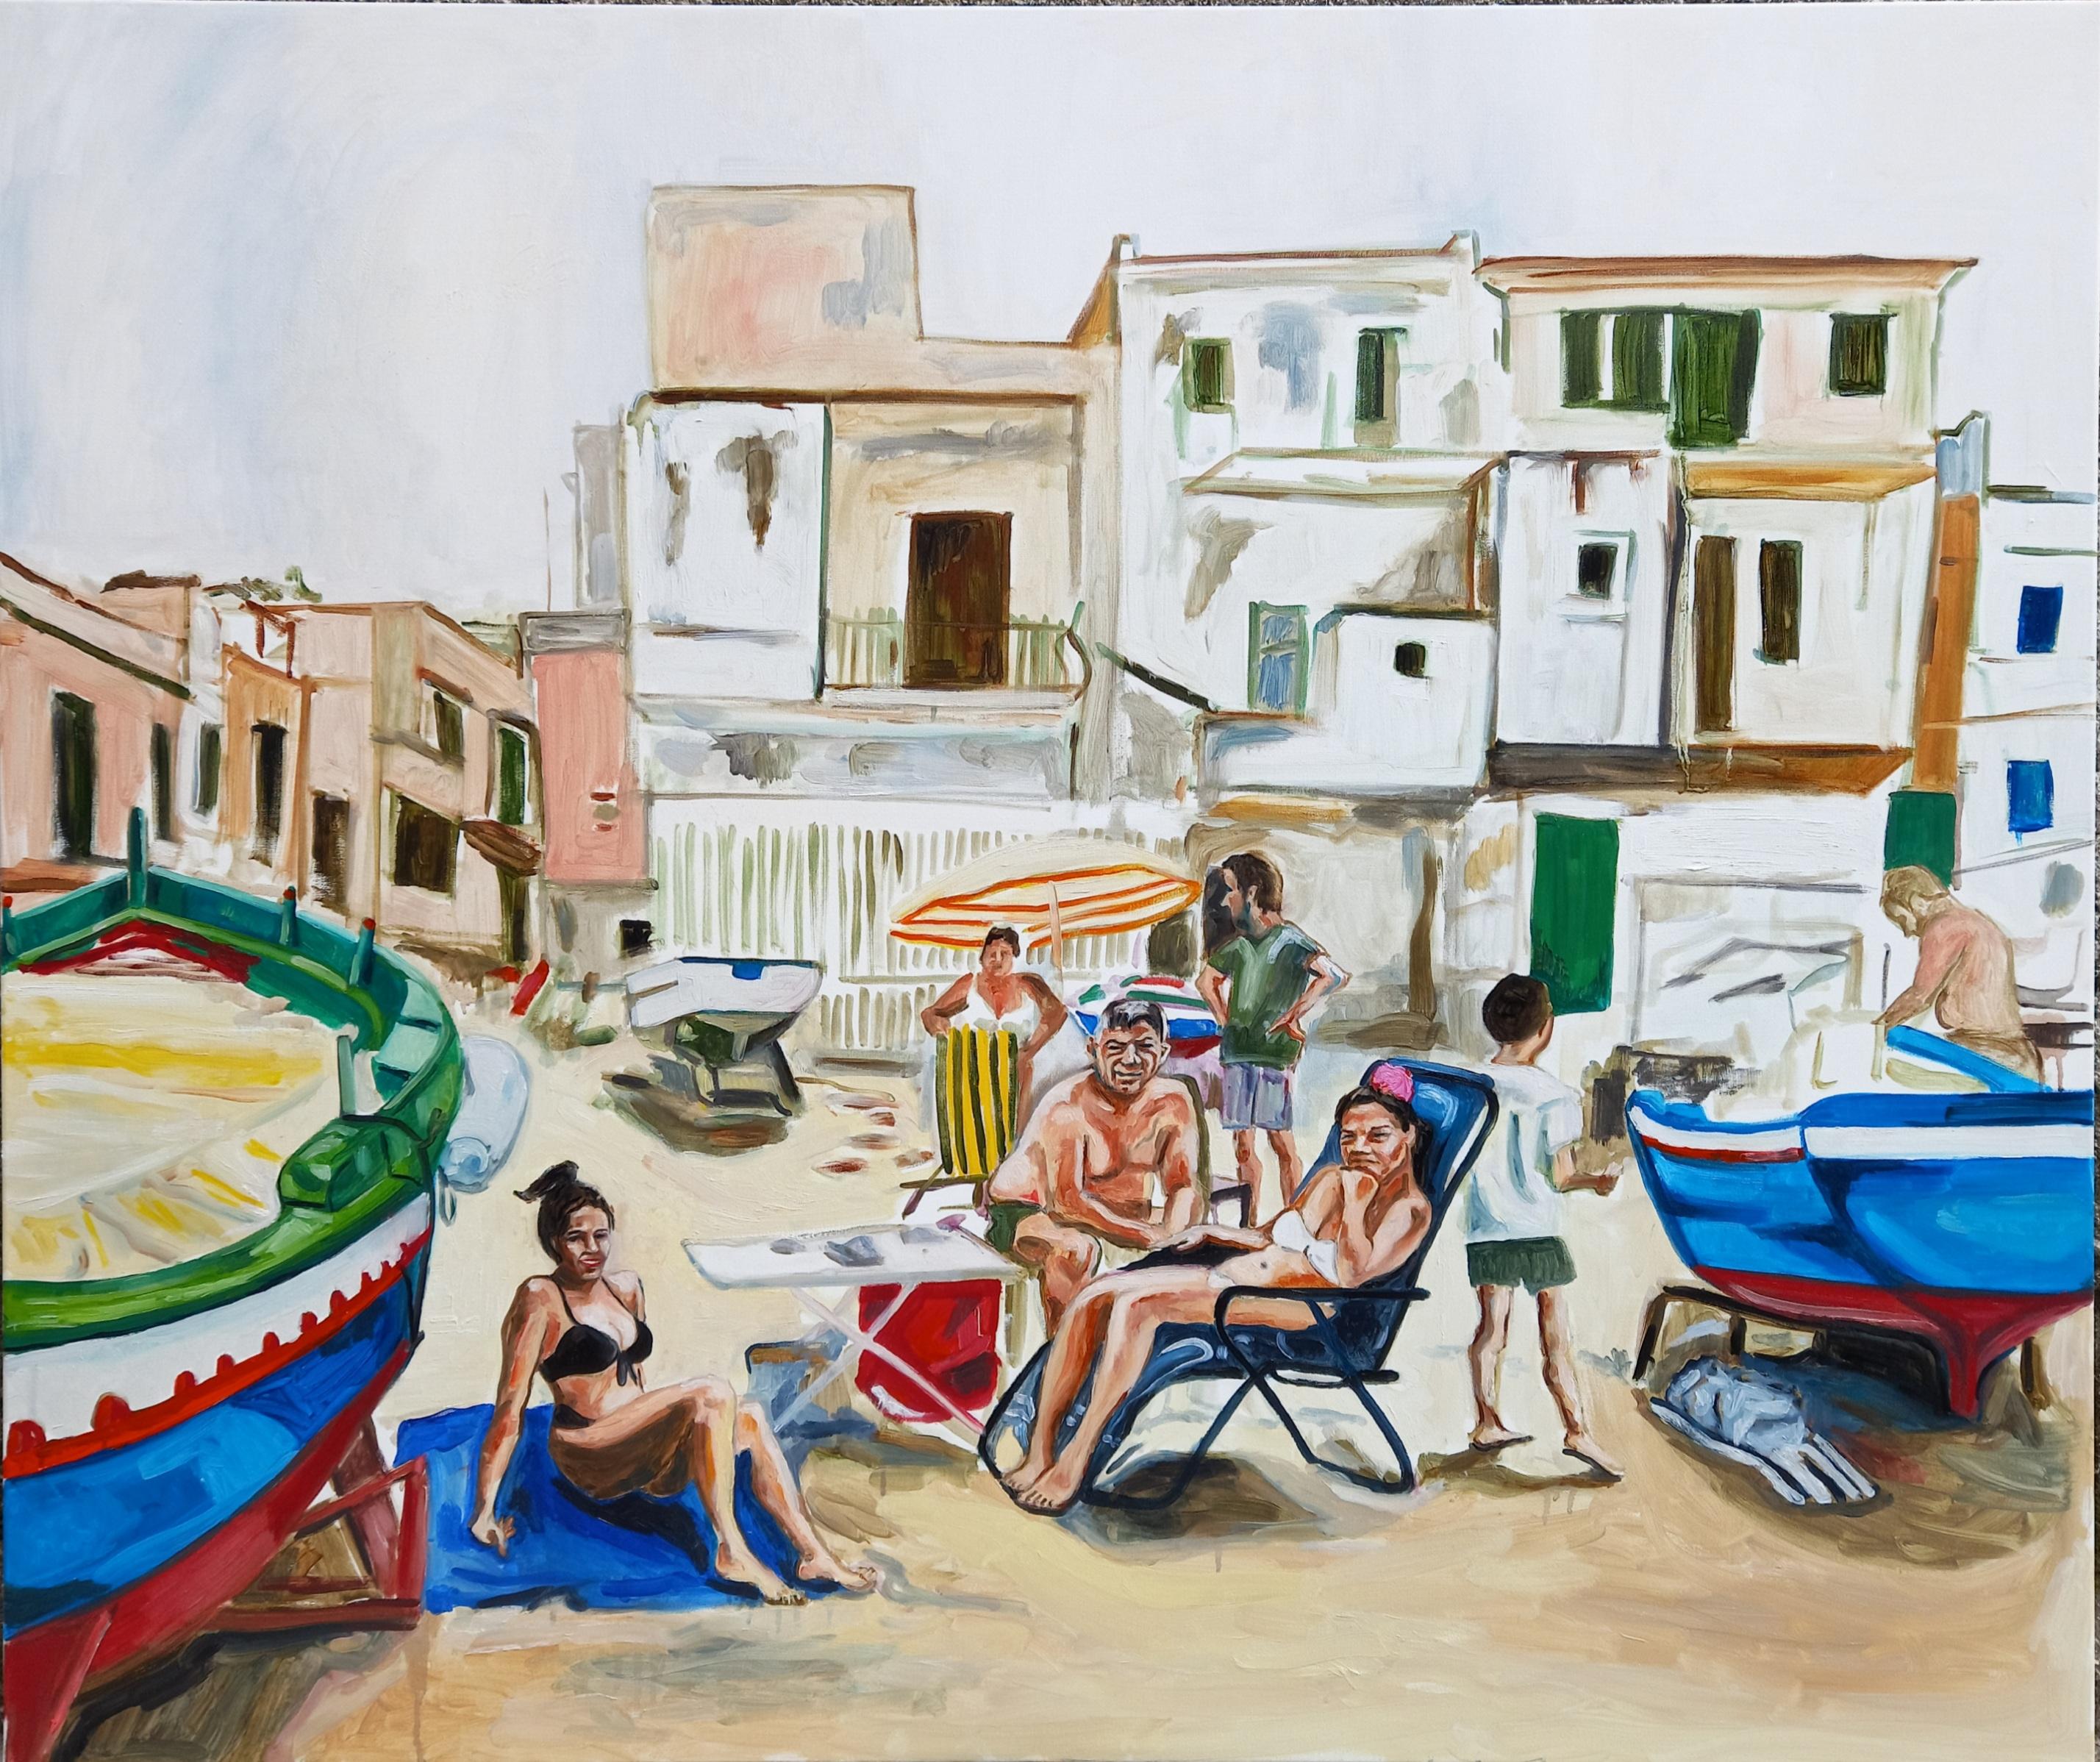 Sferracavallo, 100 cm x 120 cm, oil on canvas 2021